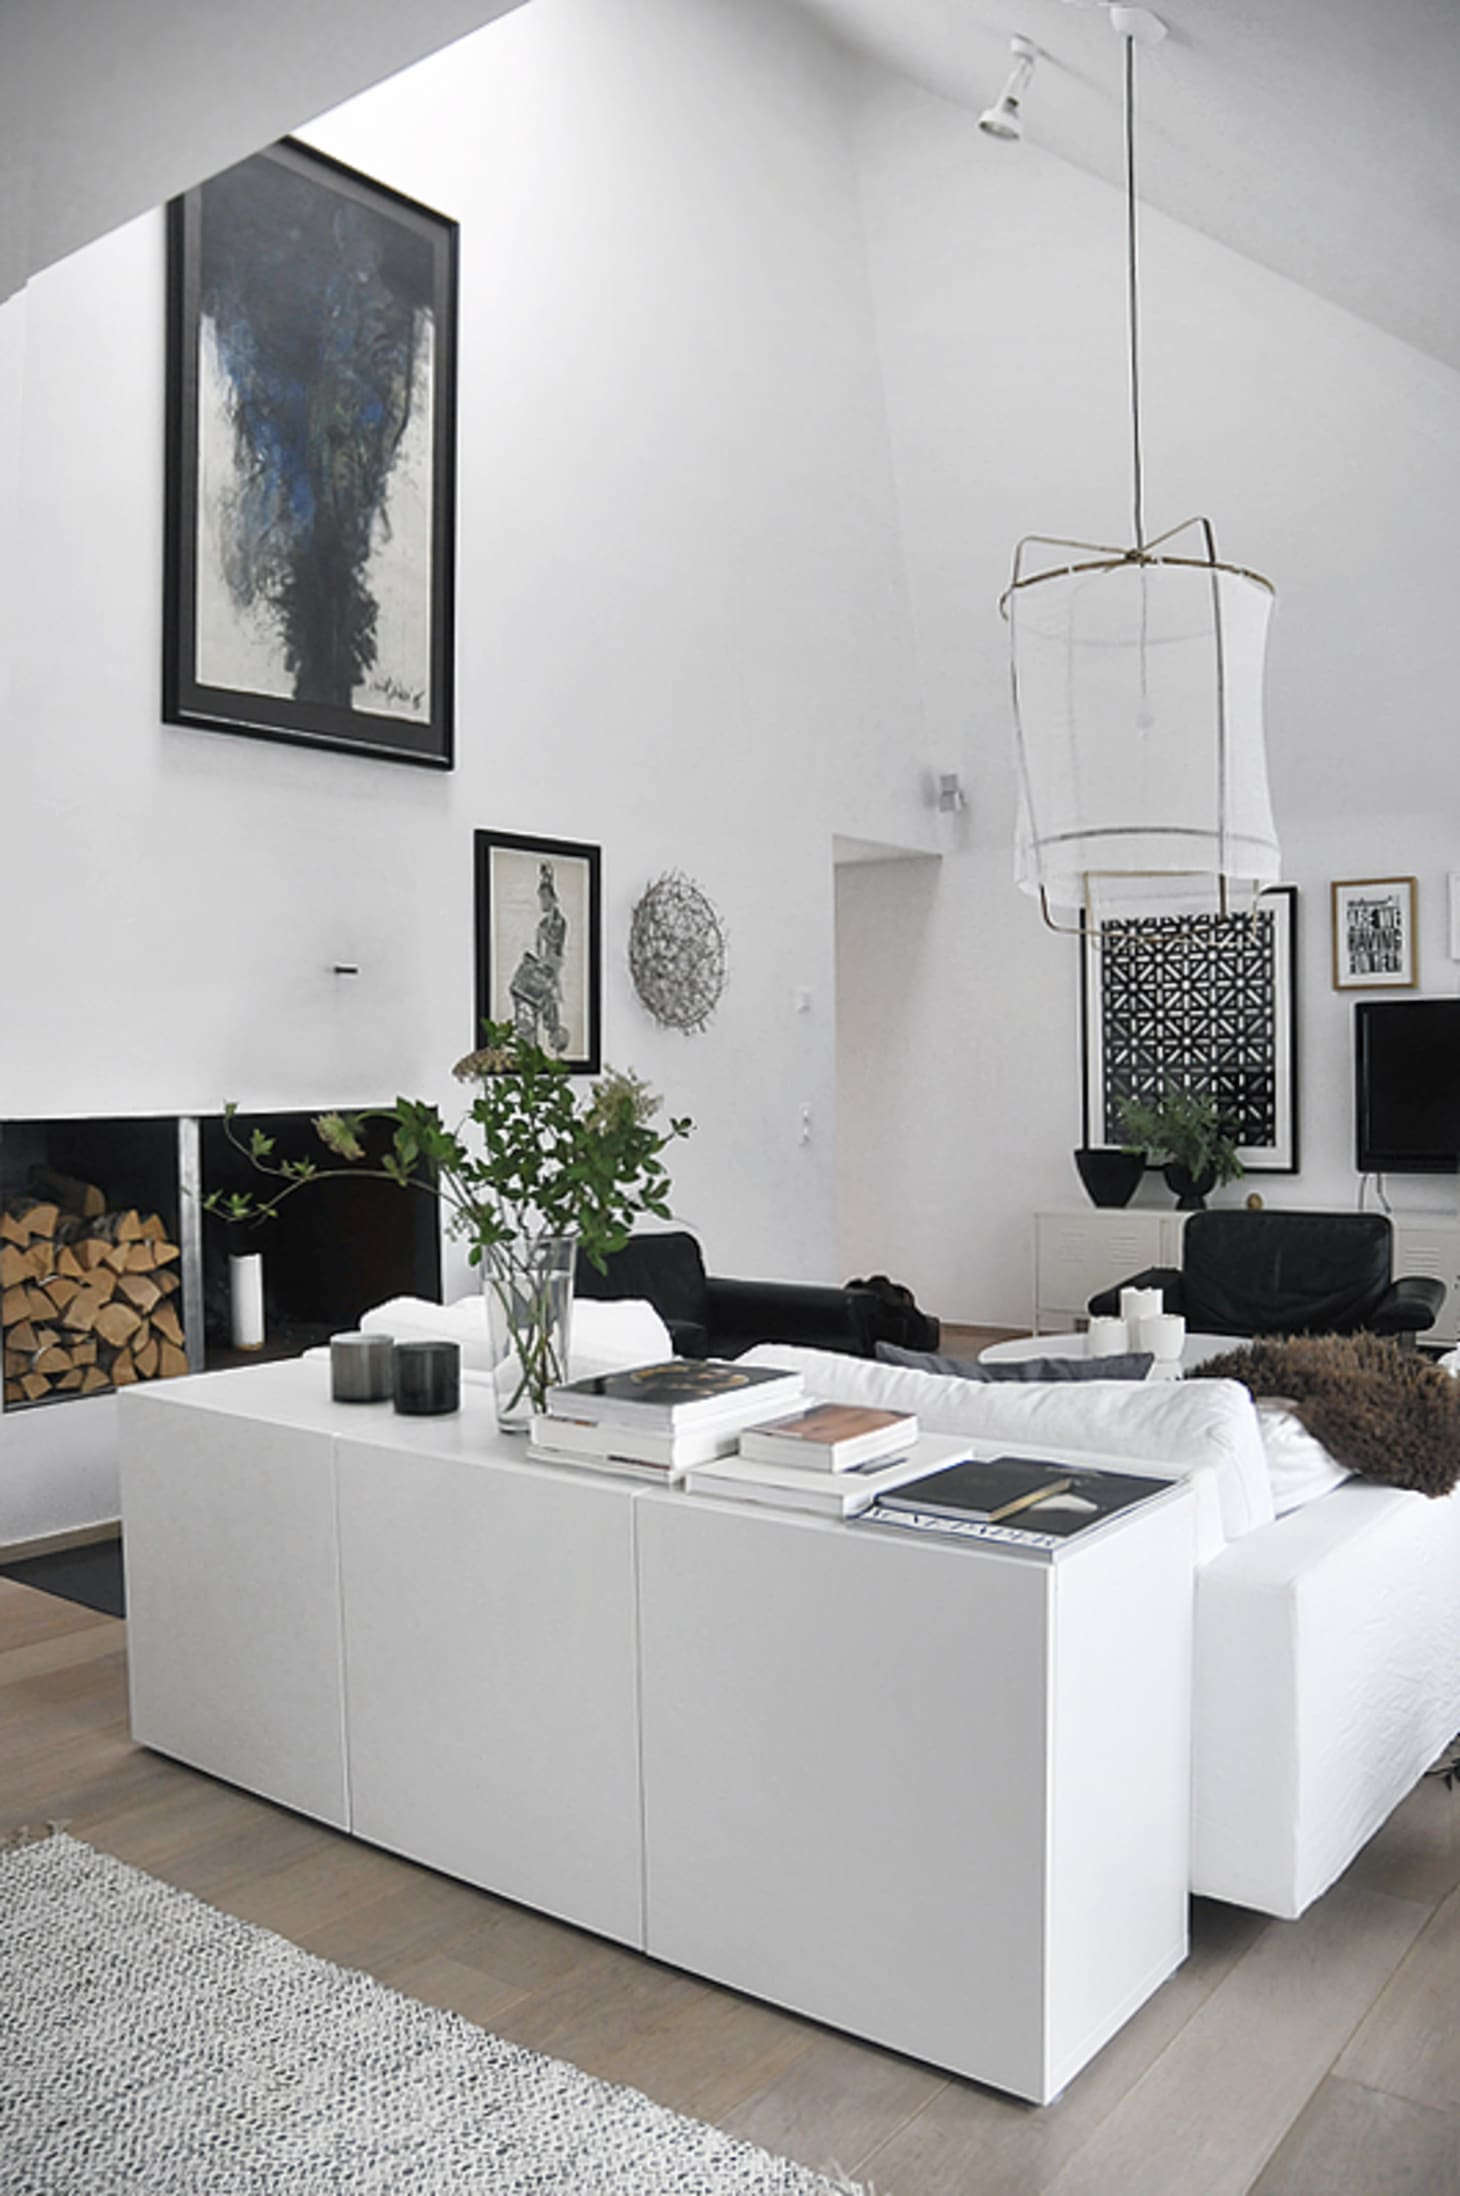 Living Room Design Ikea: The Best Of BESTA: Design Inspiration For IKEA's Most